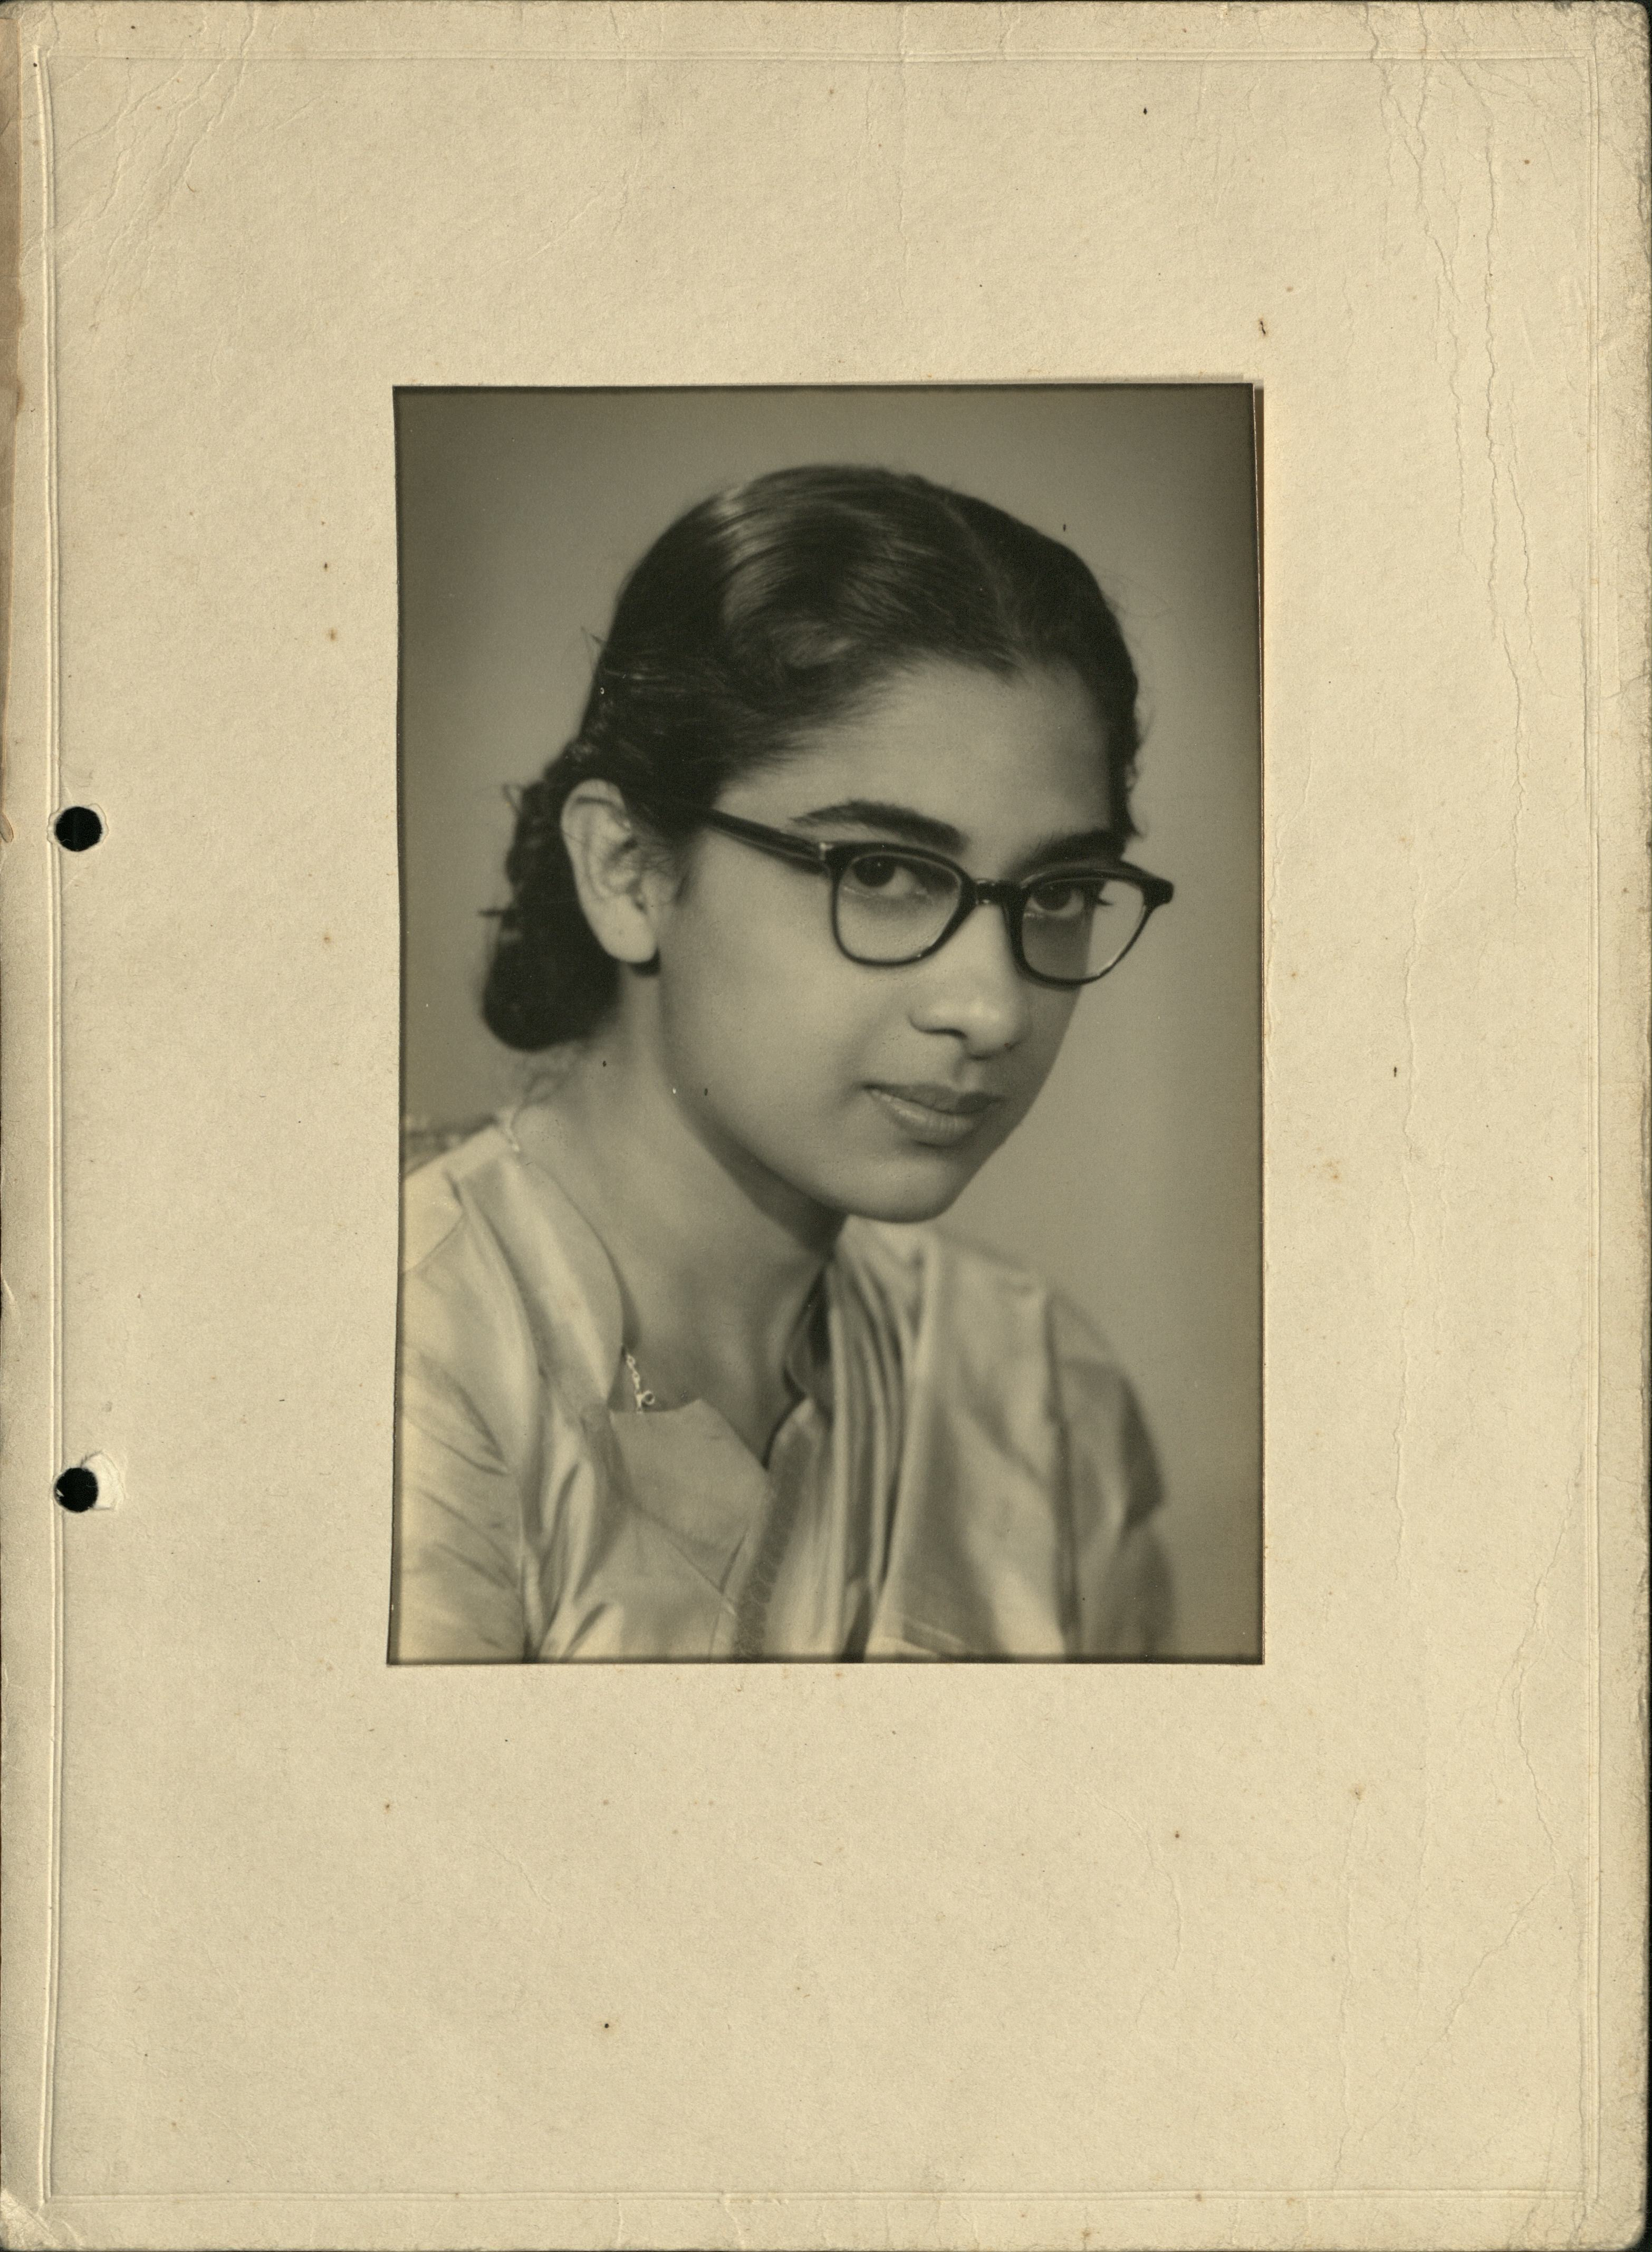 Photograph of Uma Halder from the exhibition: Hidden in plain sight: Celebrating nursing diversity